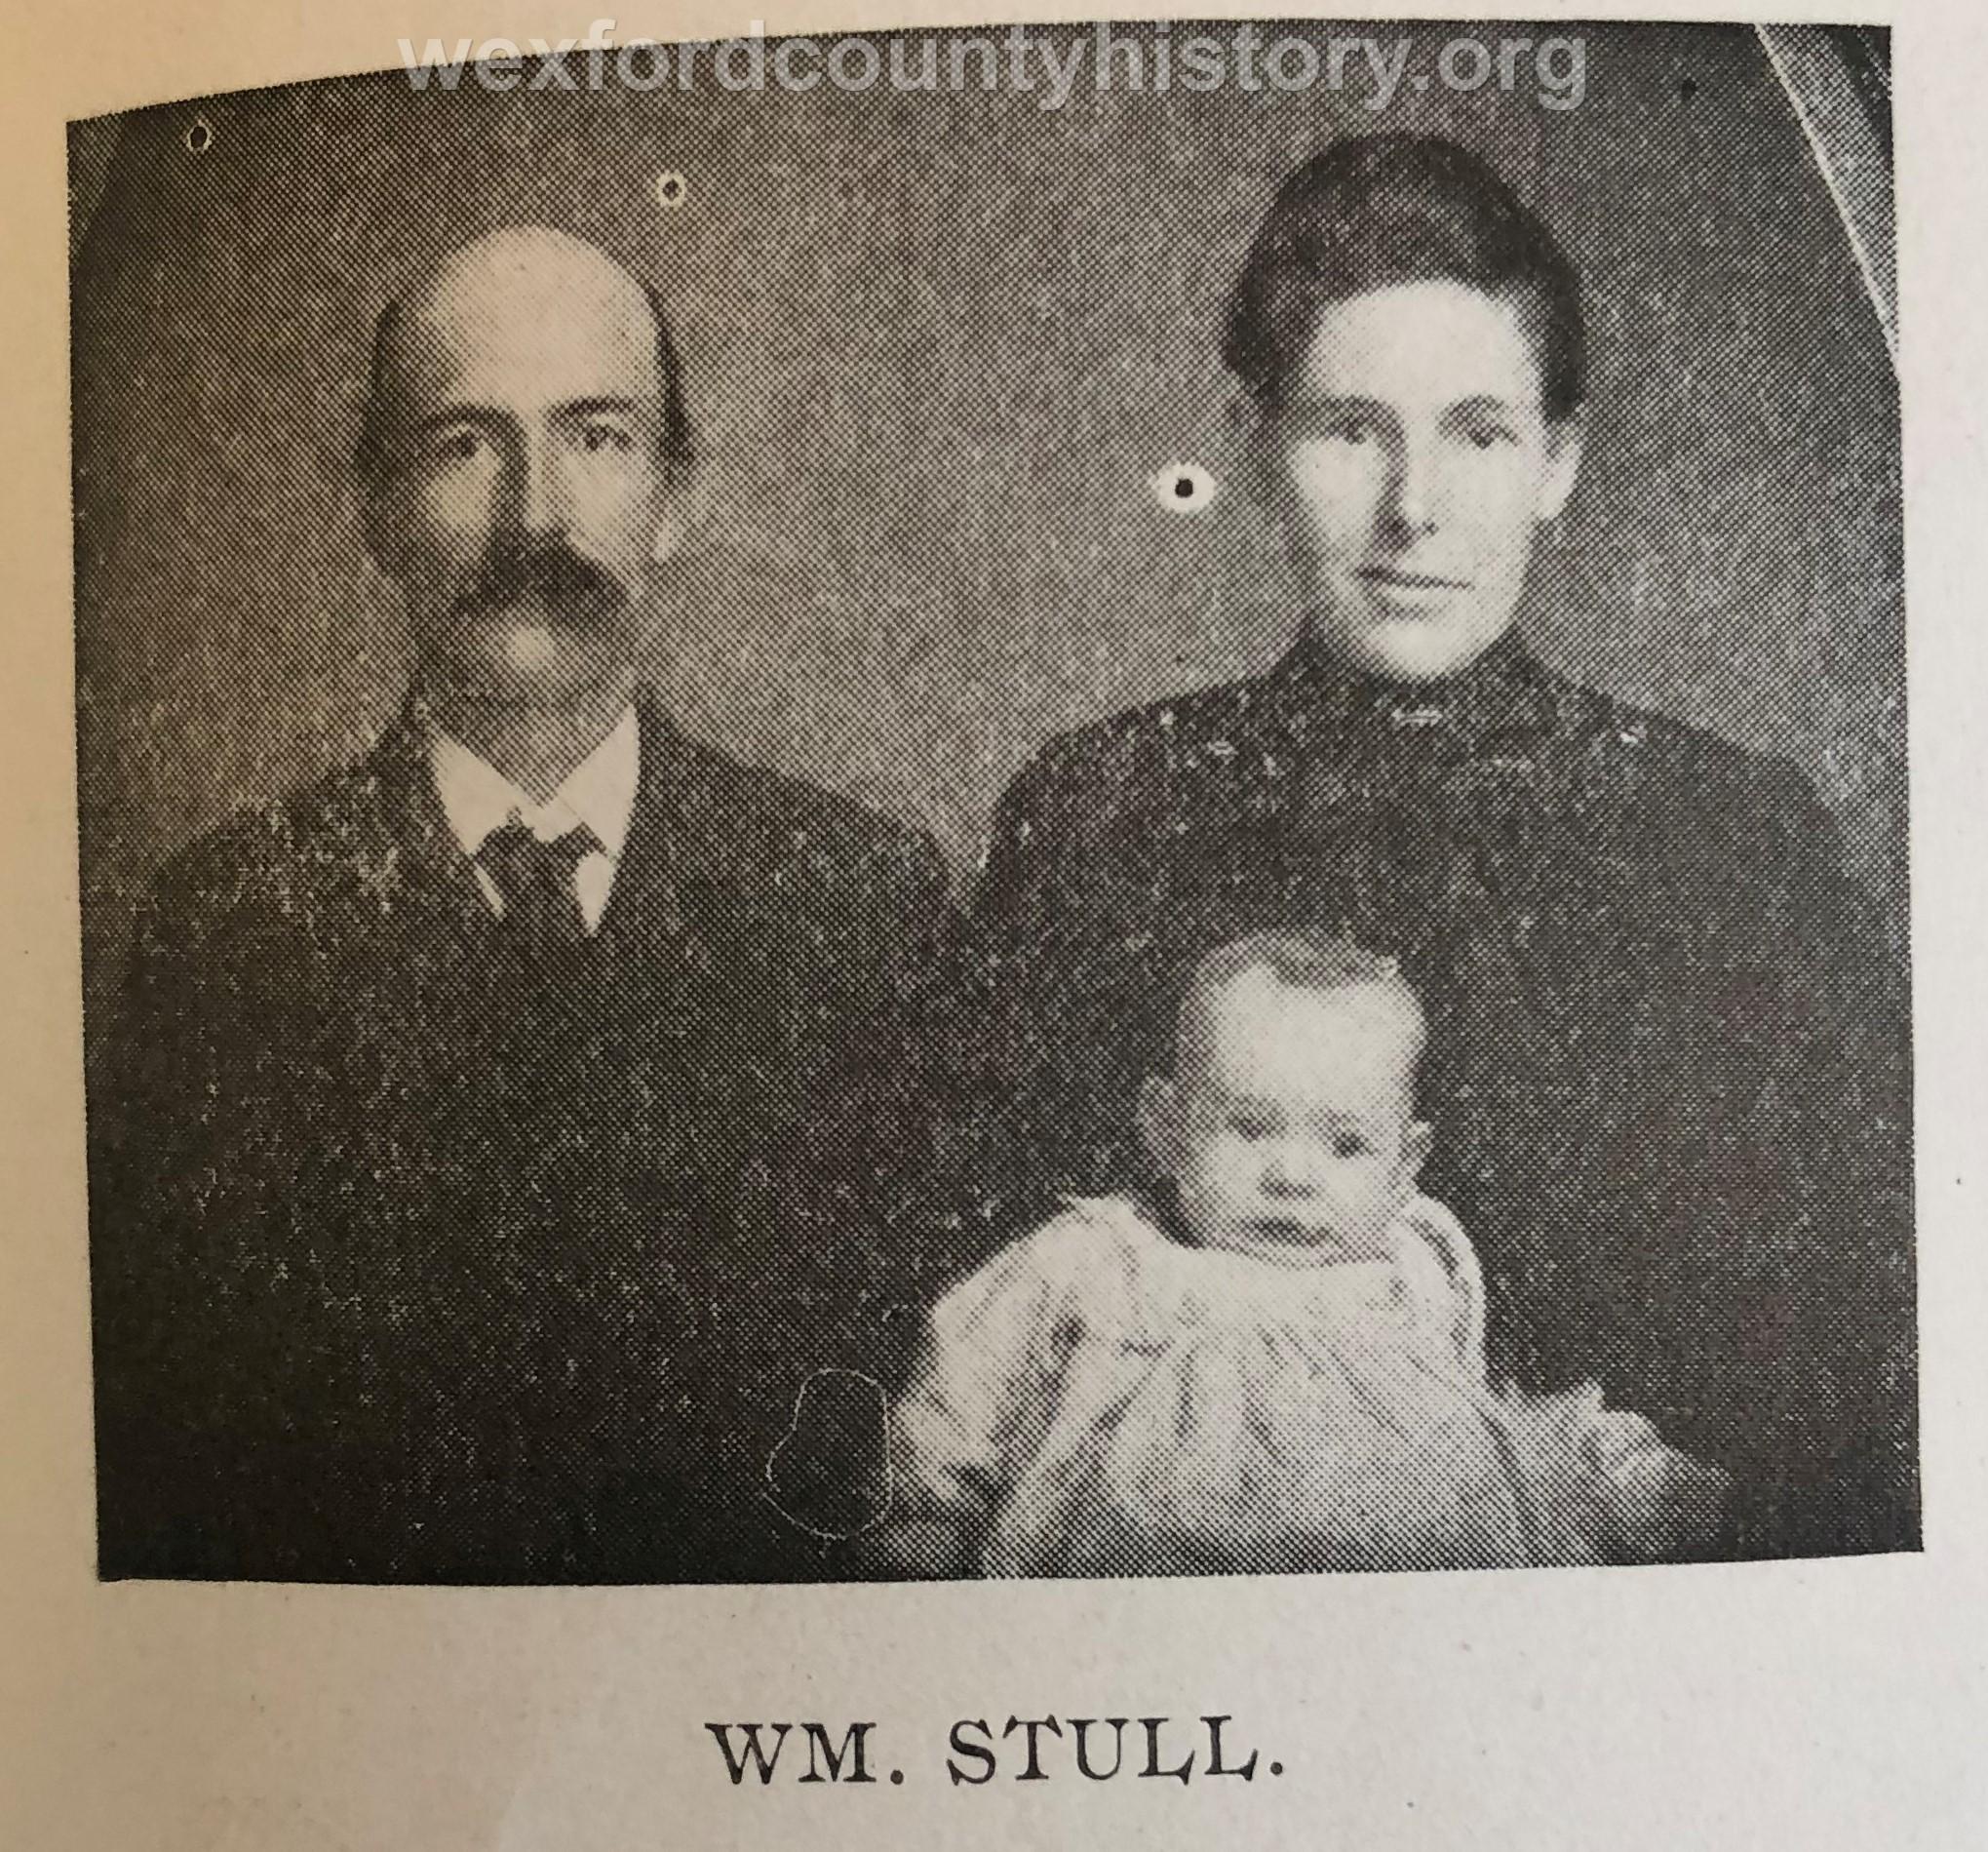 William Stull Family